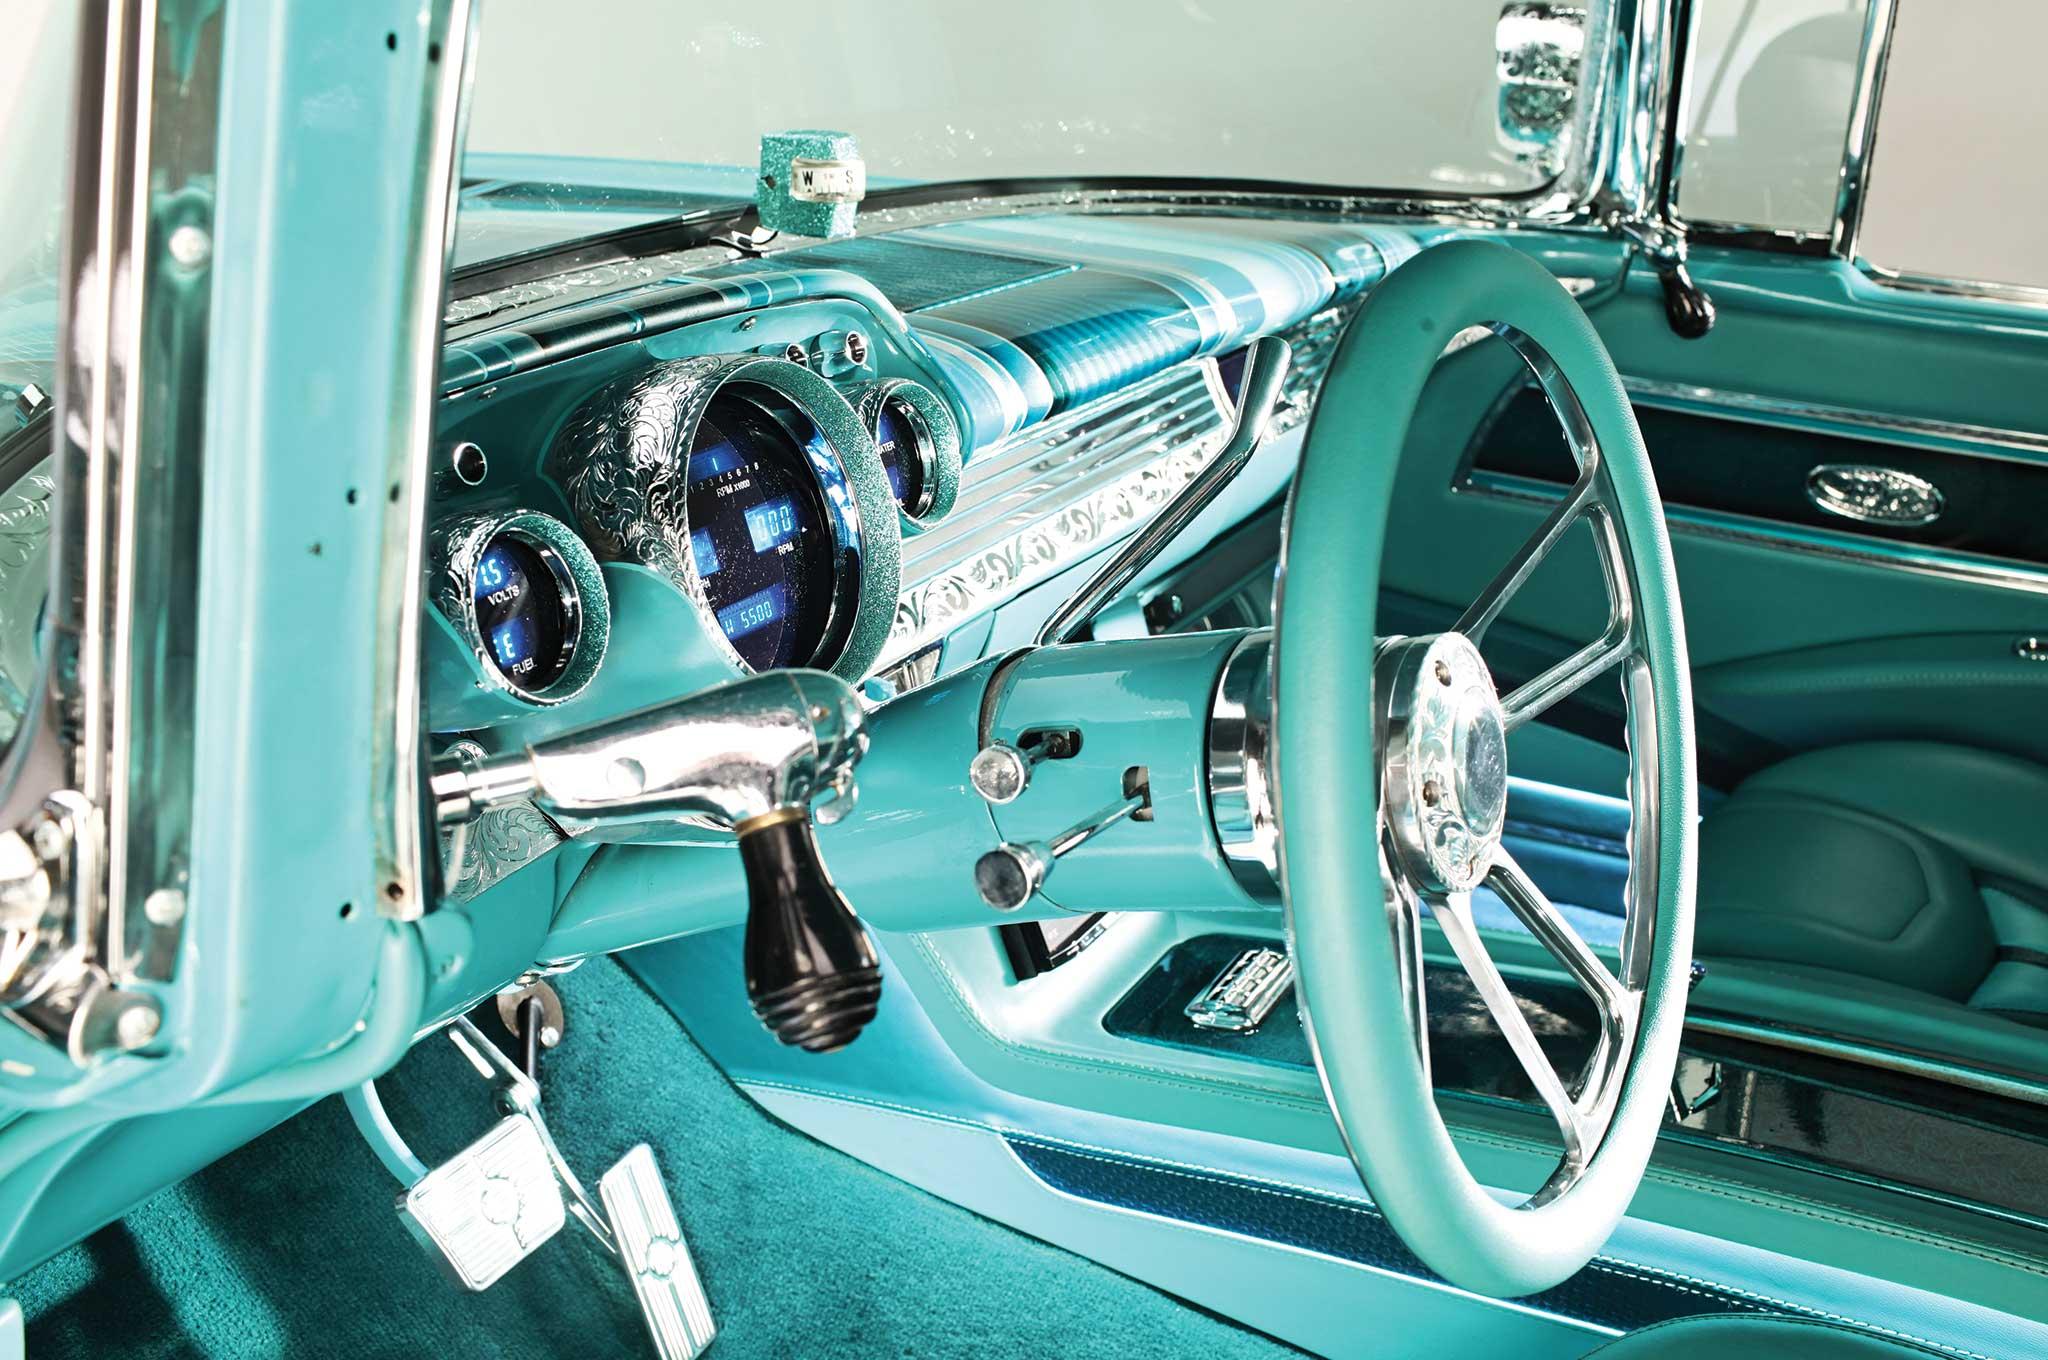 1957 Chevrolet Bel Air Modern Day Monarch Lowrider